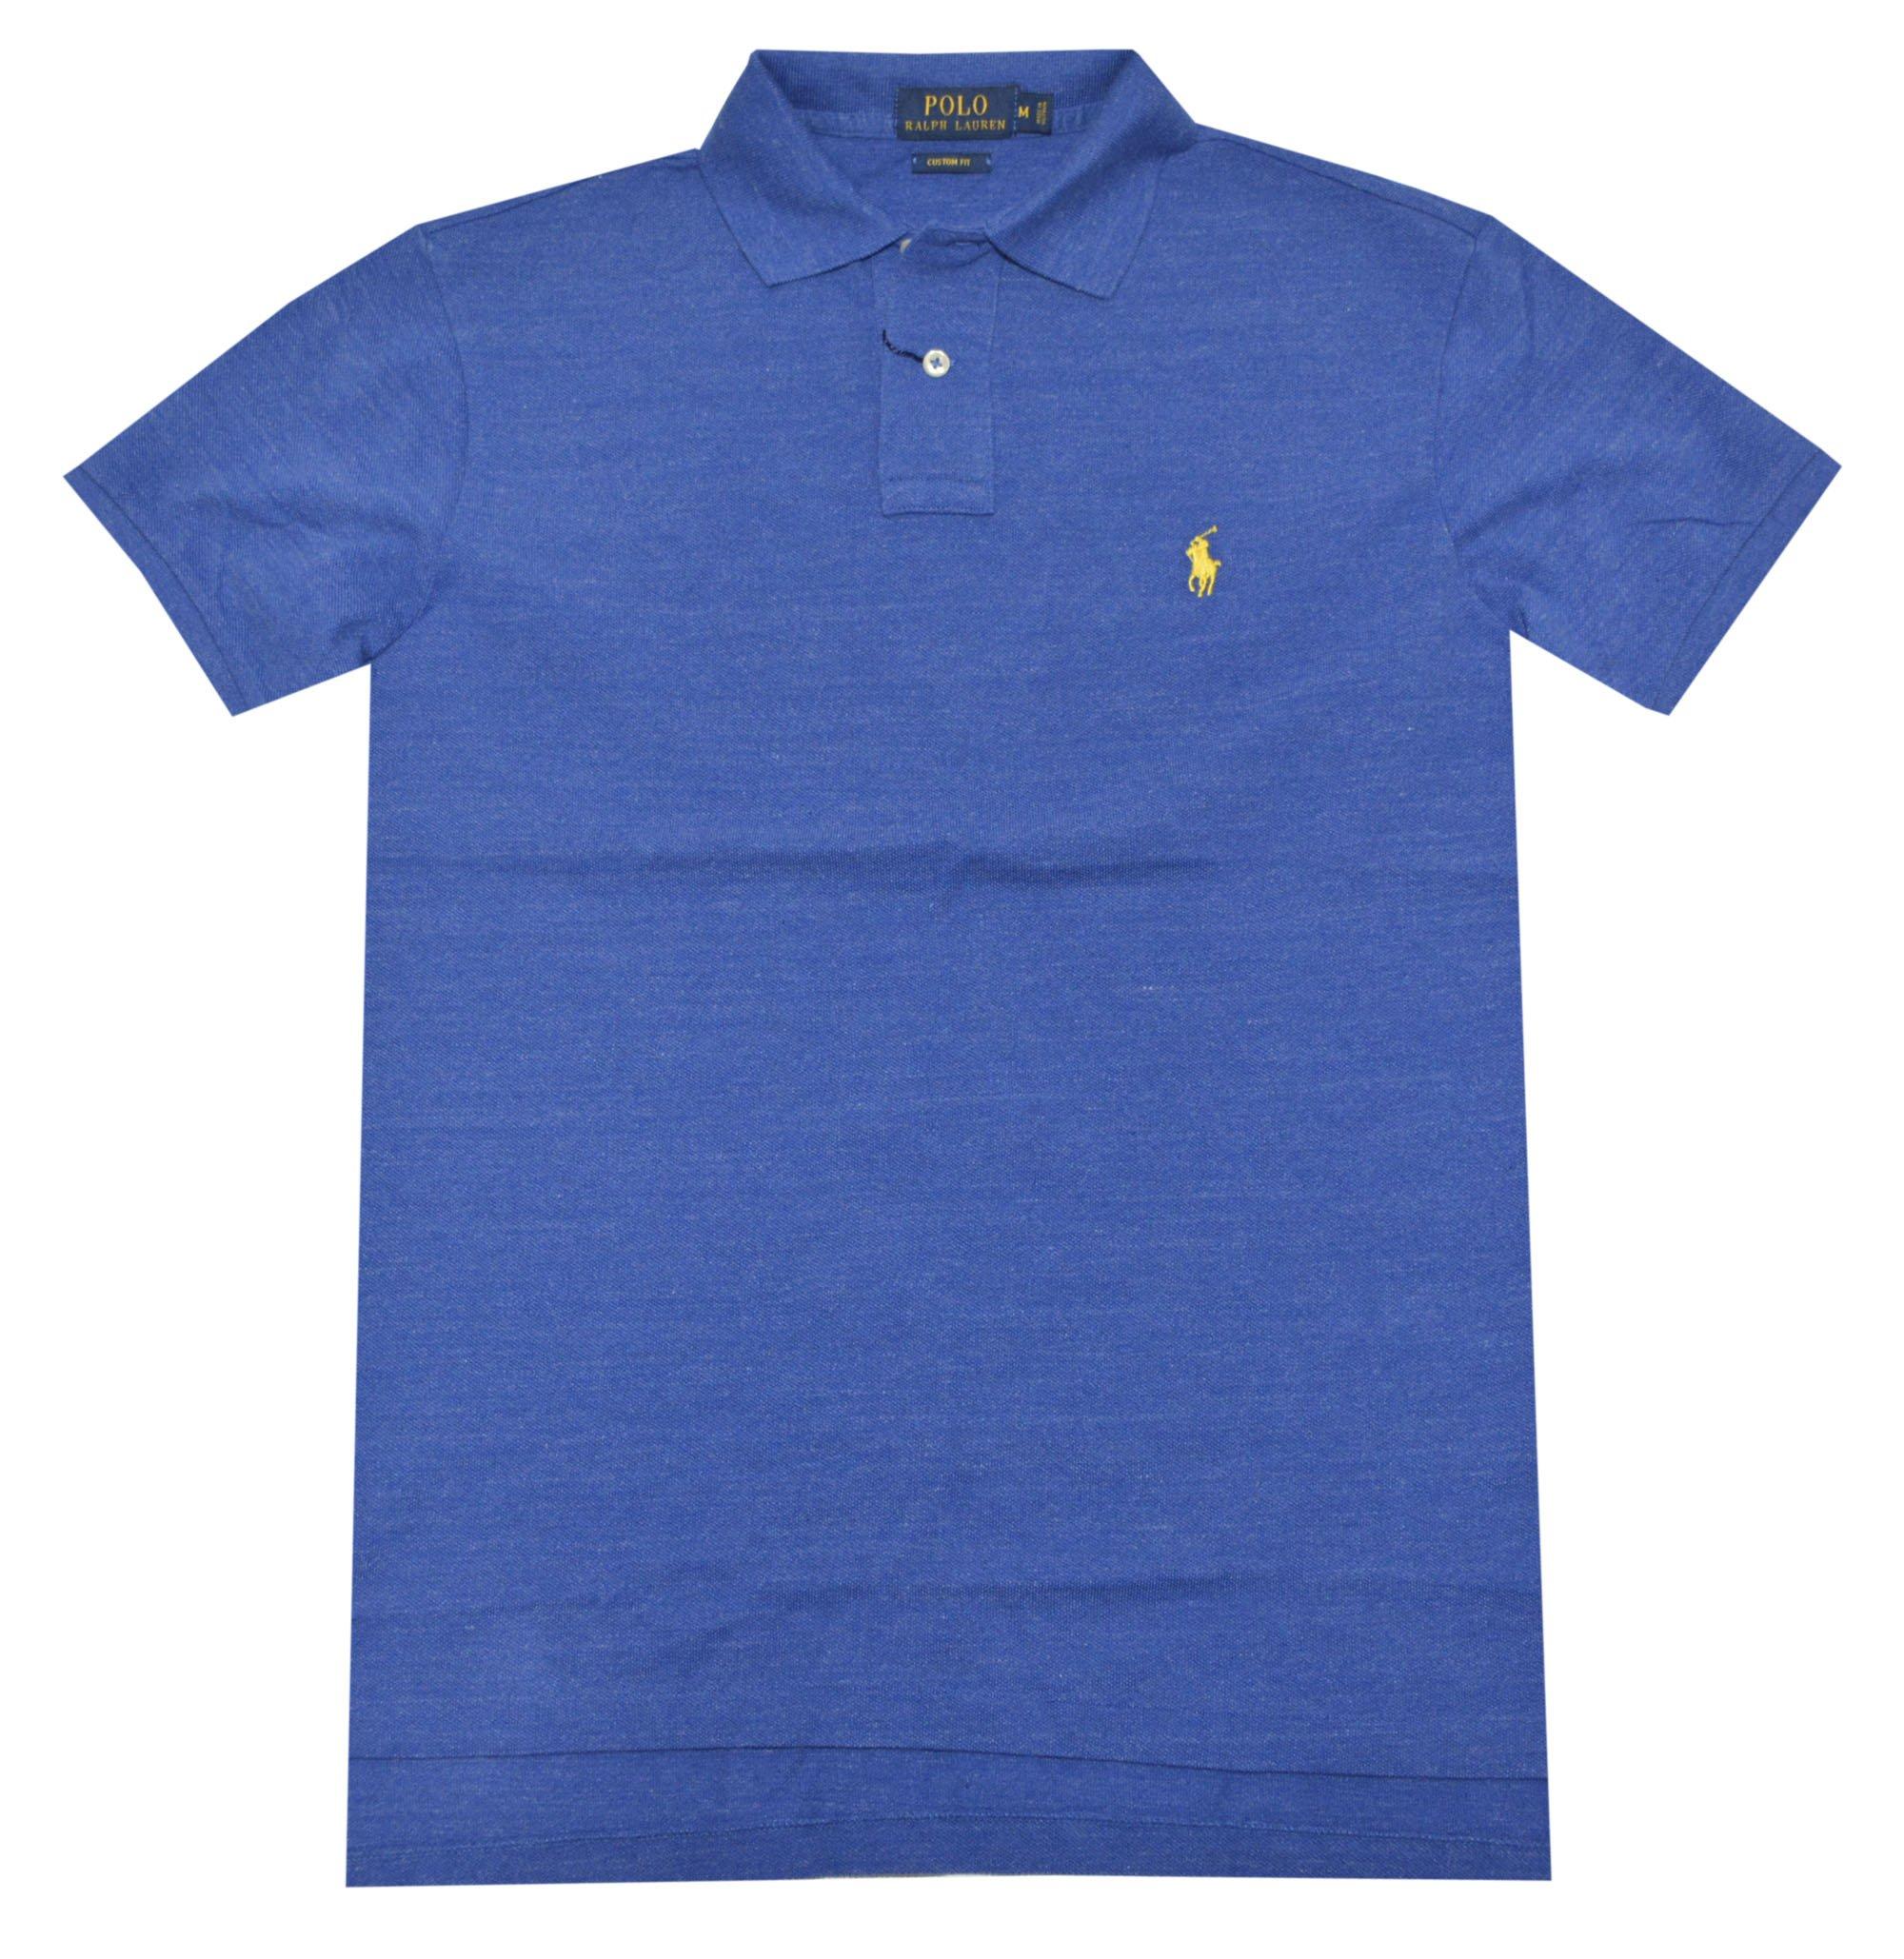 Polo Ralph Lauren Men Custom Fit Mesh Pony Logo Shirt (XX-Large, Sapphire heather) by Polo Ralph Lauren (Image #1)